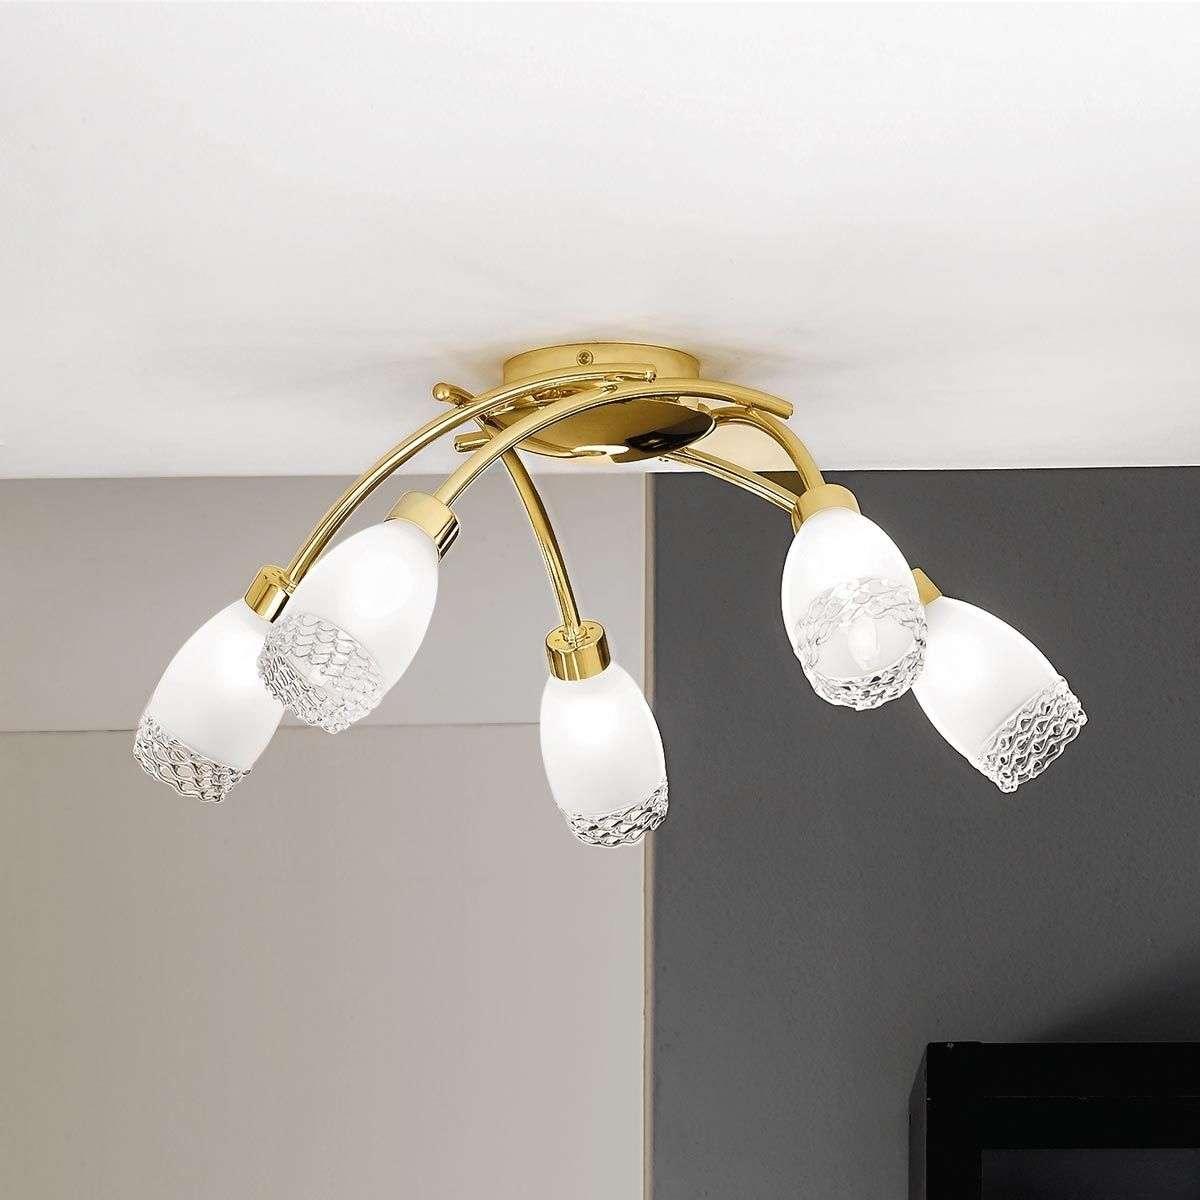 Ilena Brass Ceiling Light With Glass Shades 7254638 31